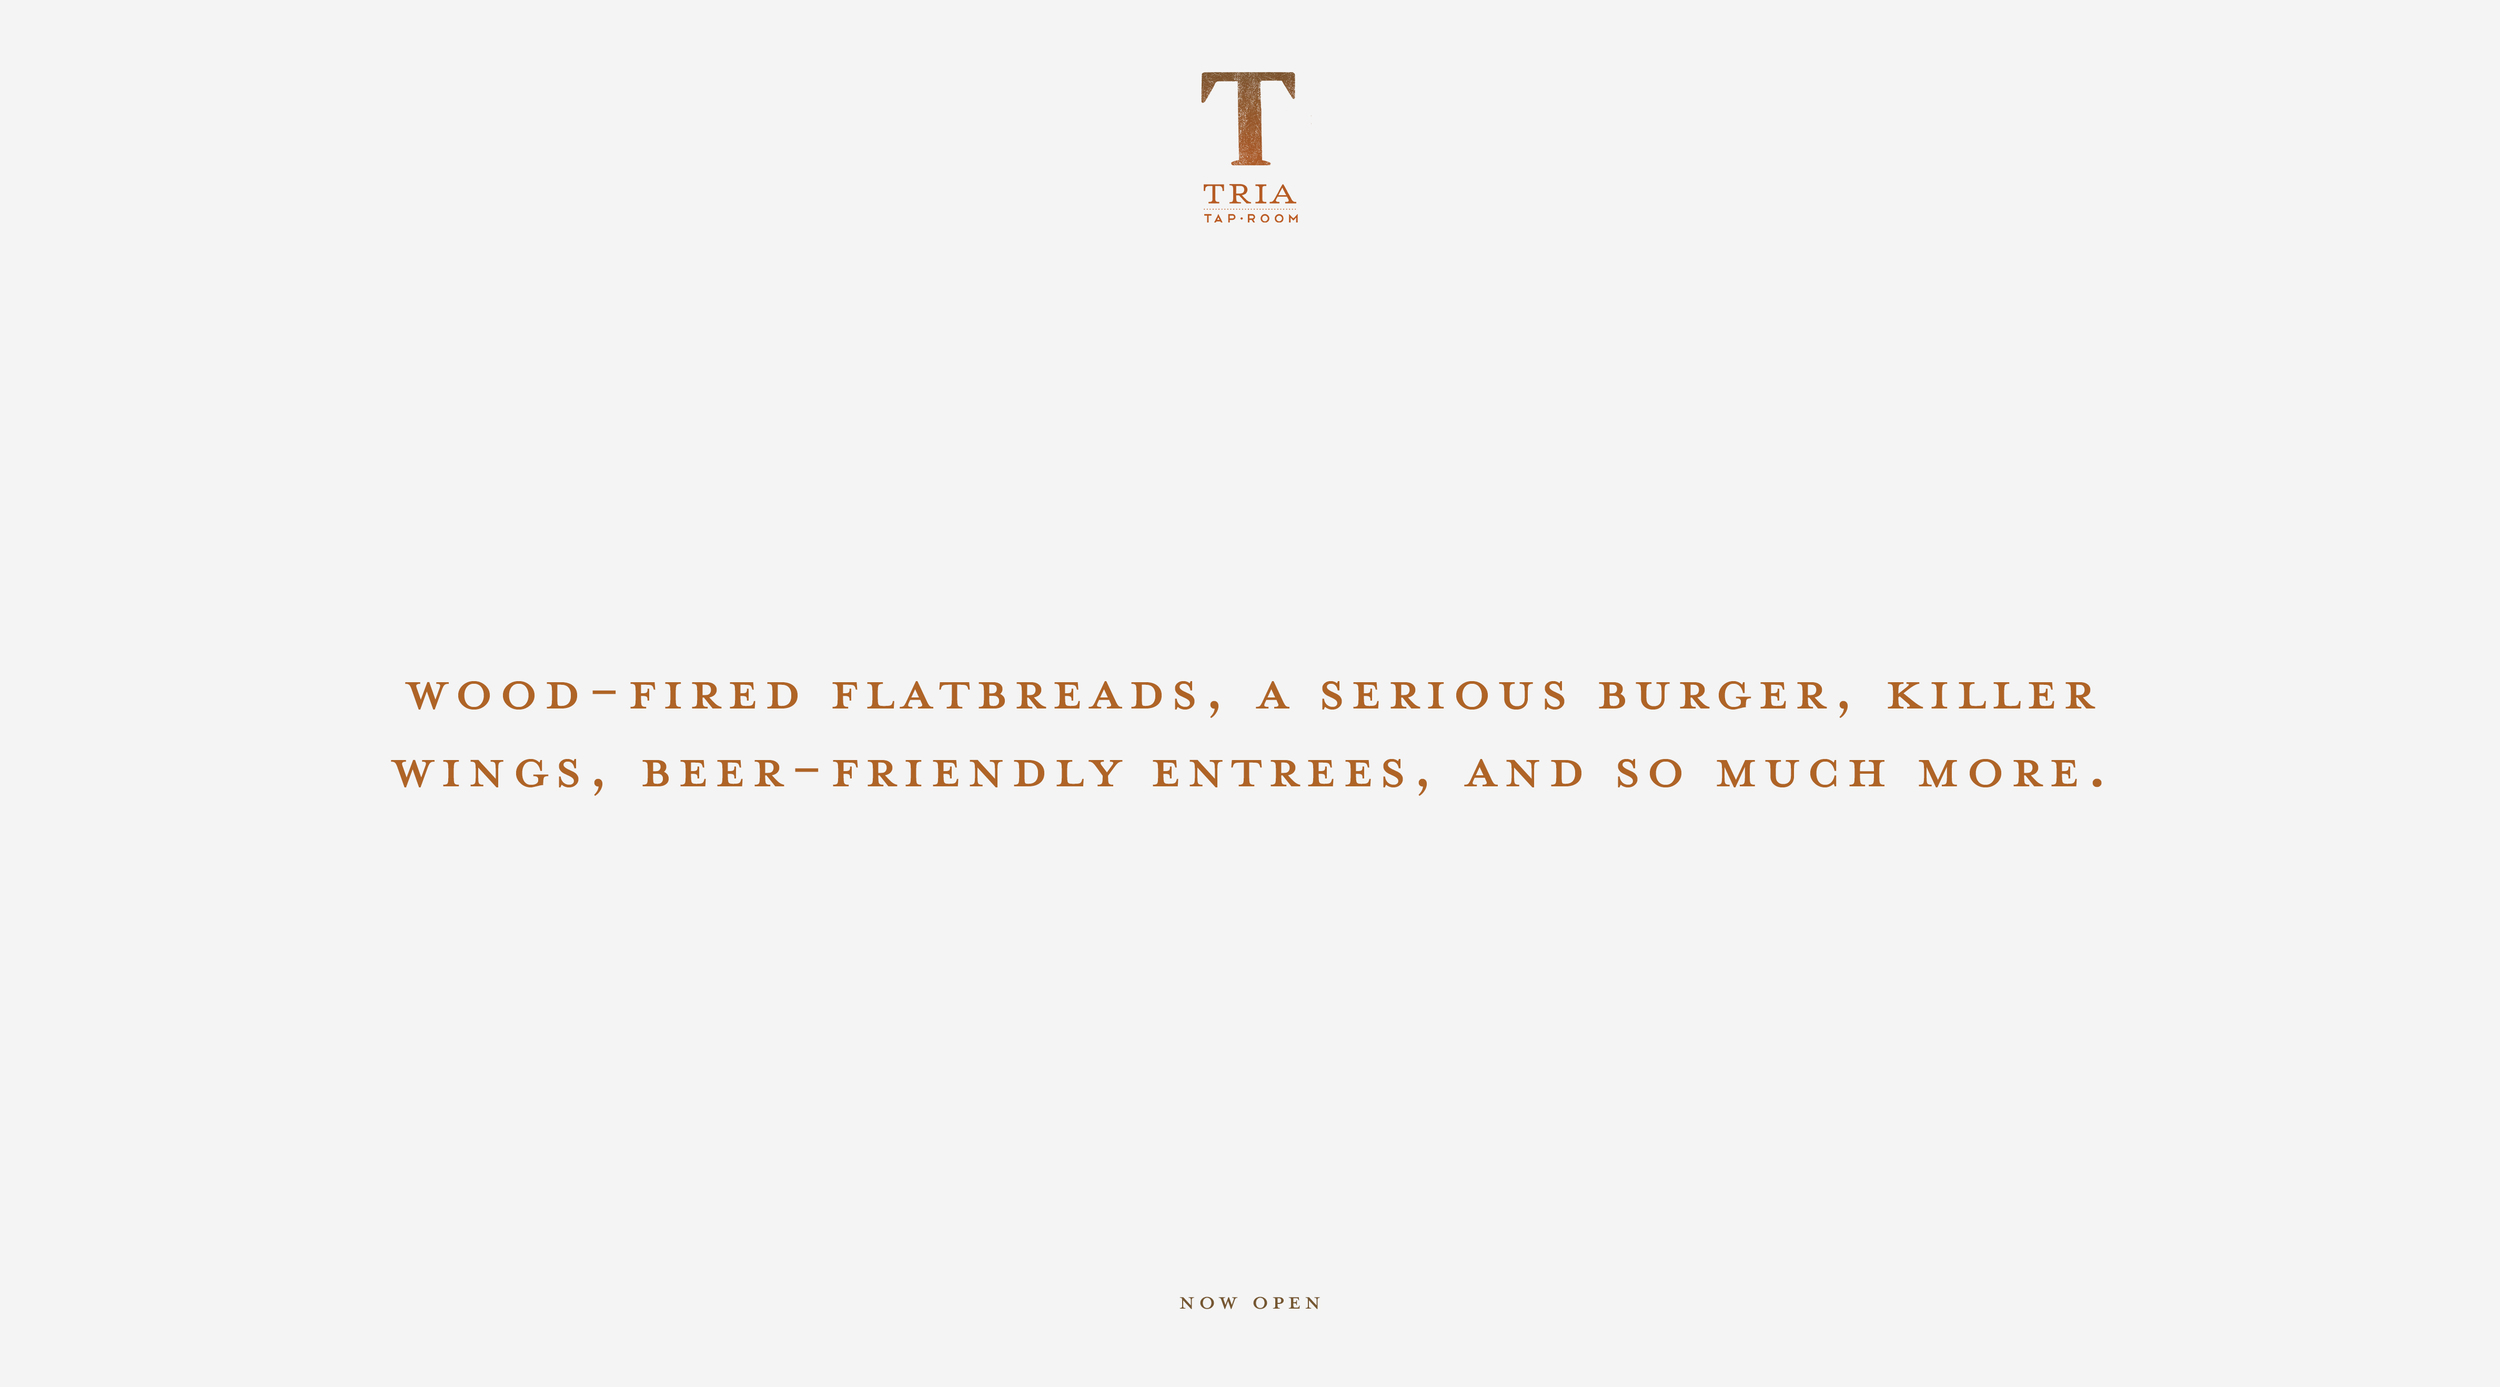 TriaTaproom_Quote4.jpg